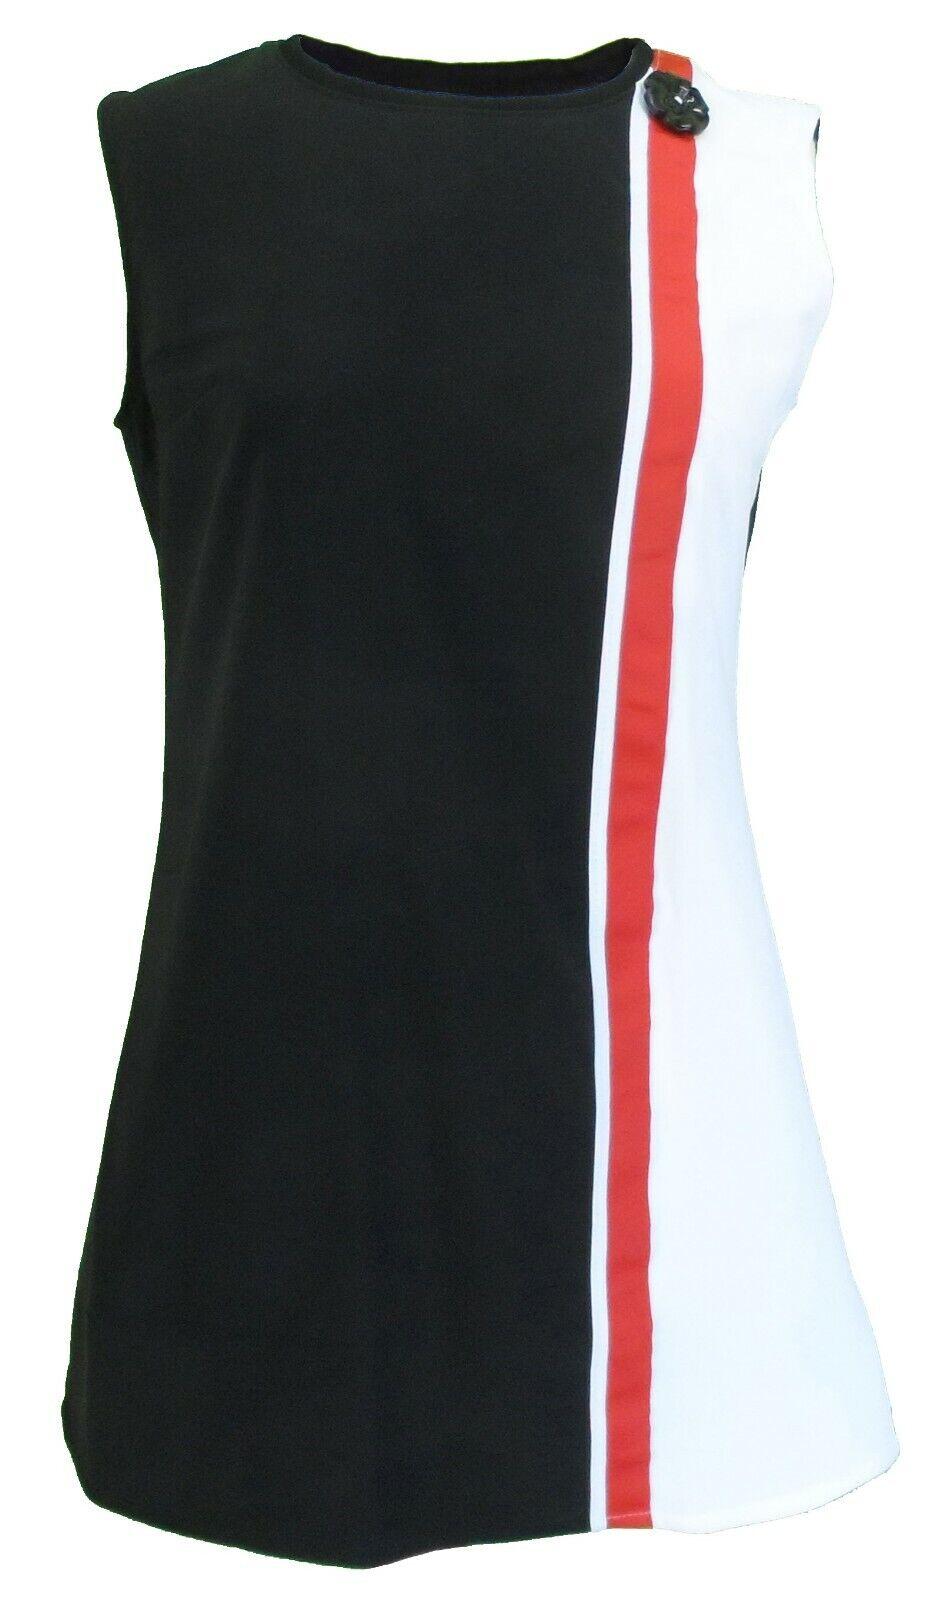 Ladies 60s Retro Mod Vintage schwarz Weiß rot Mini Dress